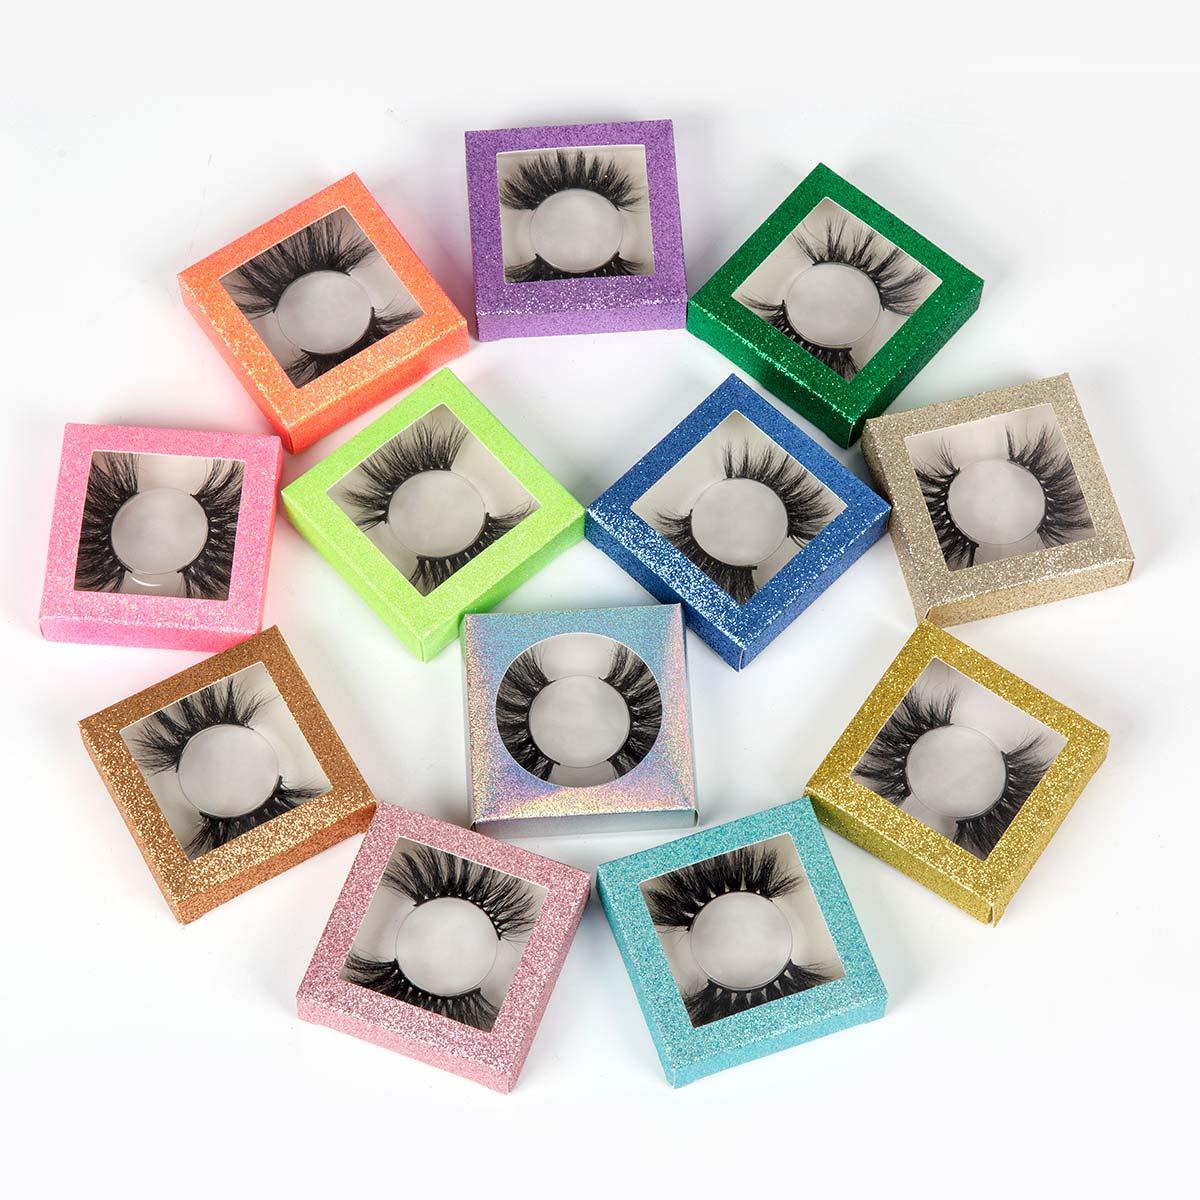 Square Packing Box For Eyelash Blank Eyelashes Plastic Package All Transparent Lid Tray Eyelashes DIY Soft Packing Box